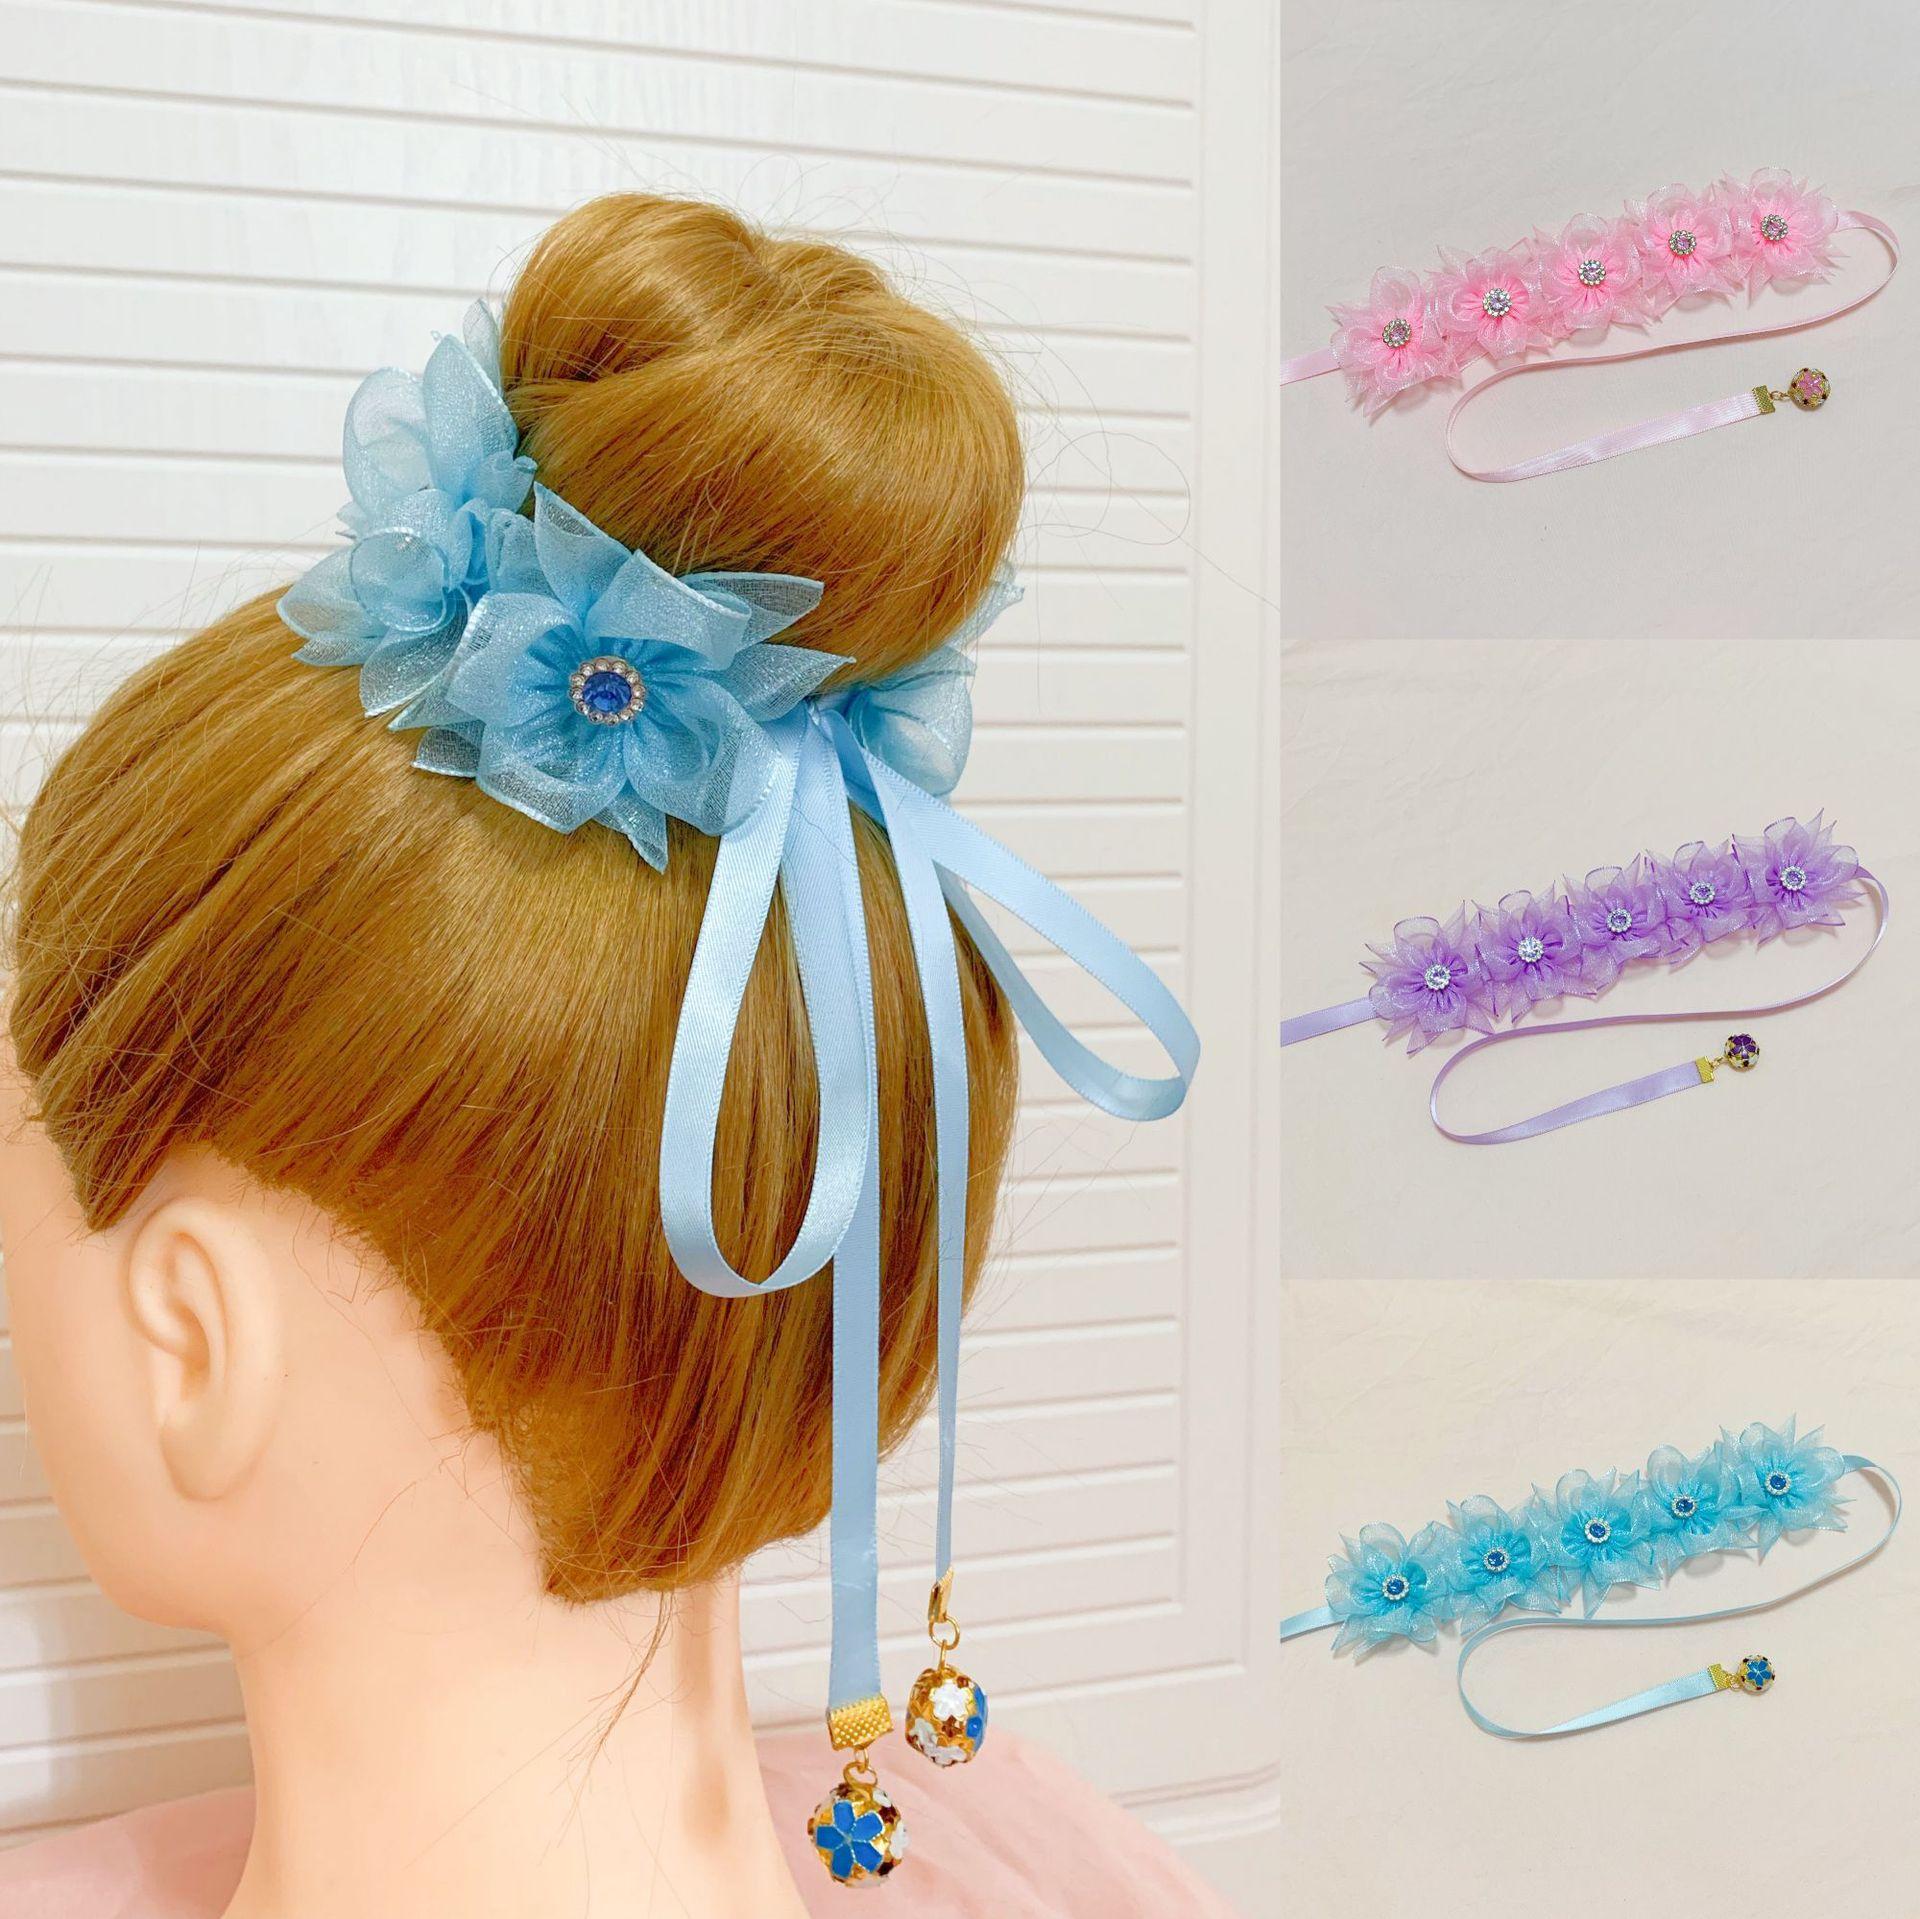 Lovely Flower Hair Tie for Garden-Themed Occasions